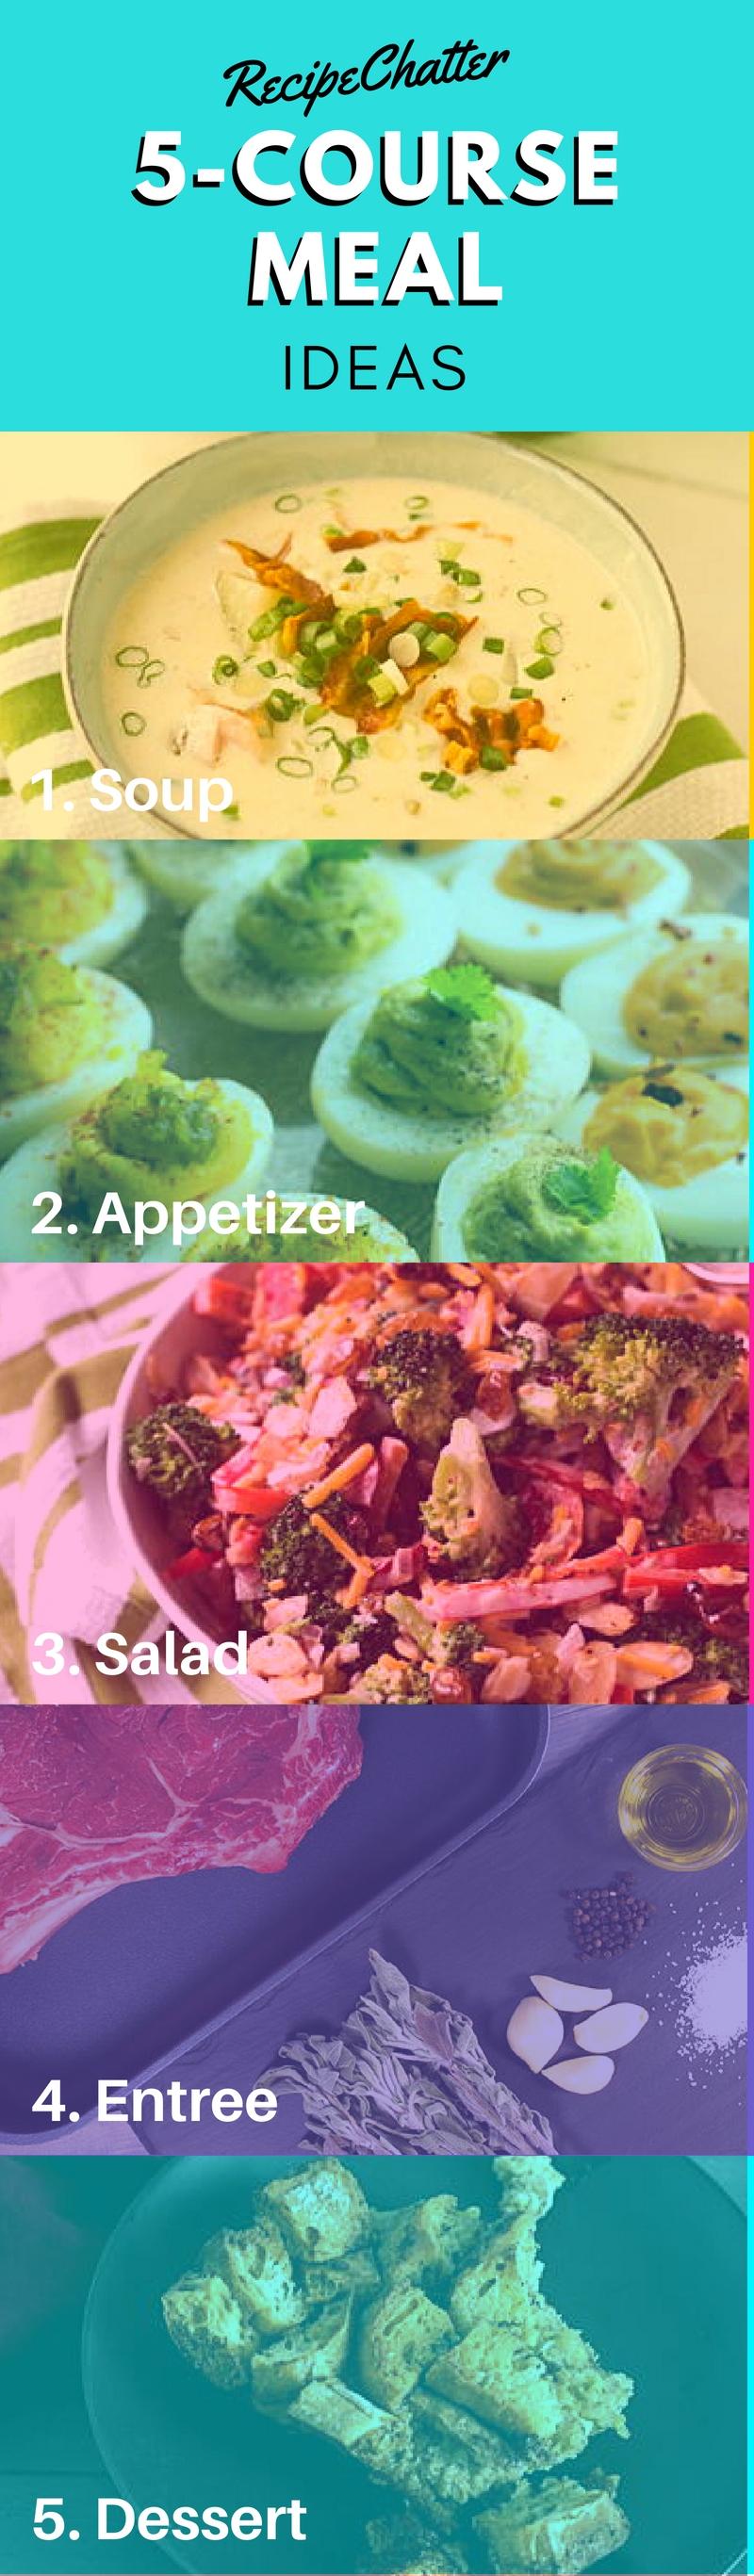 5-Course Meal Ideas